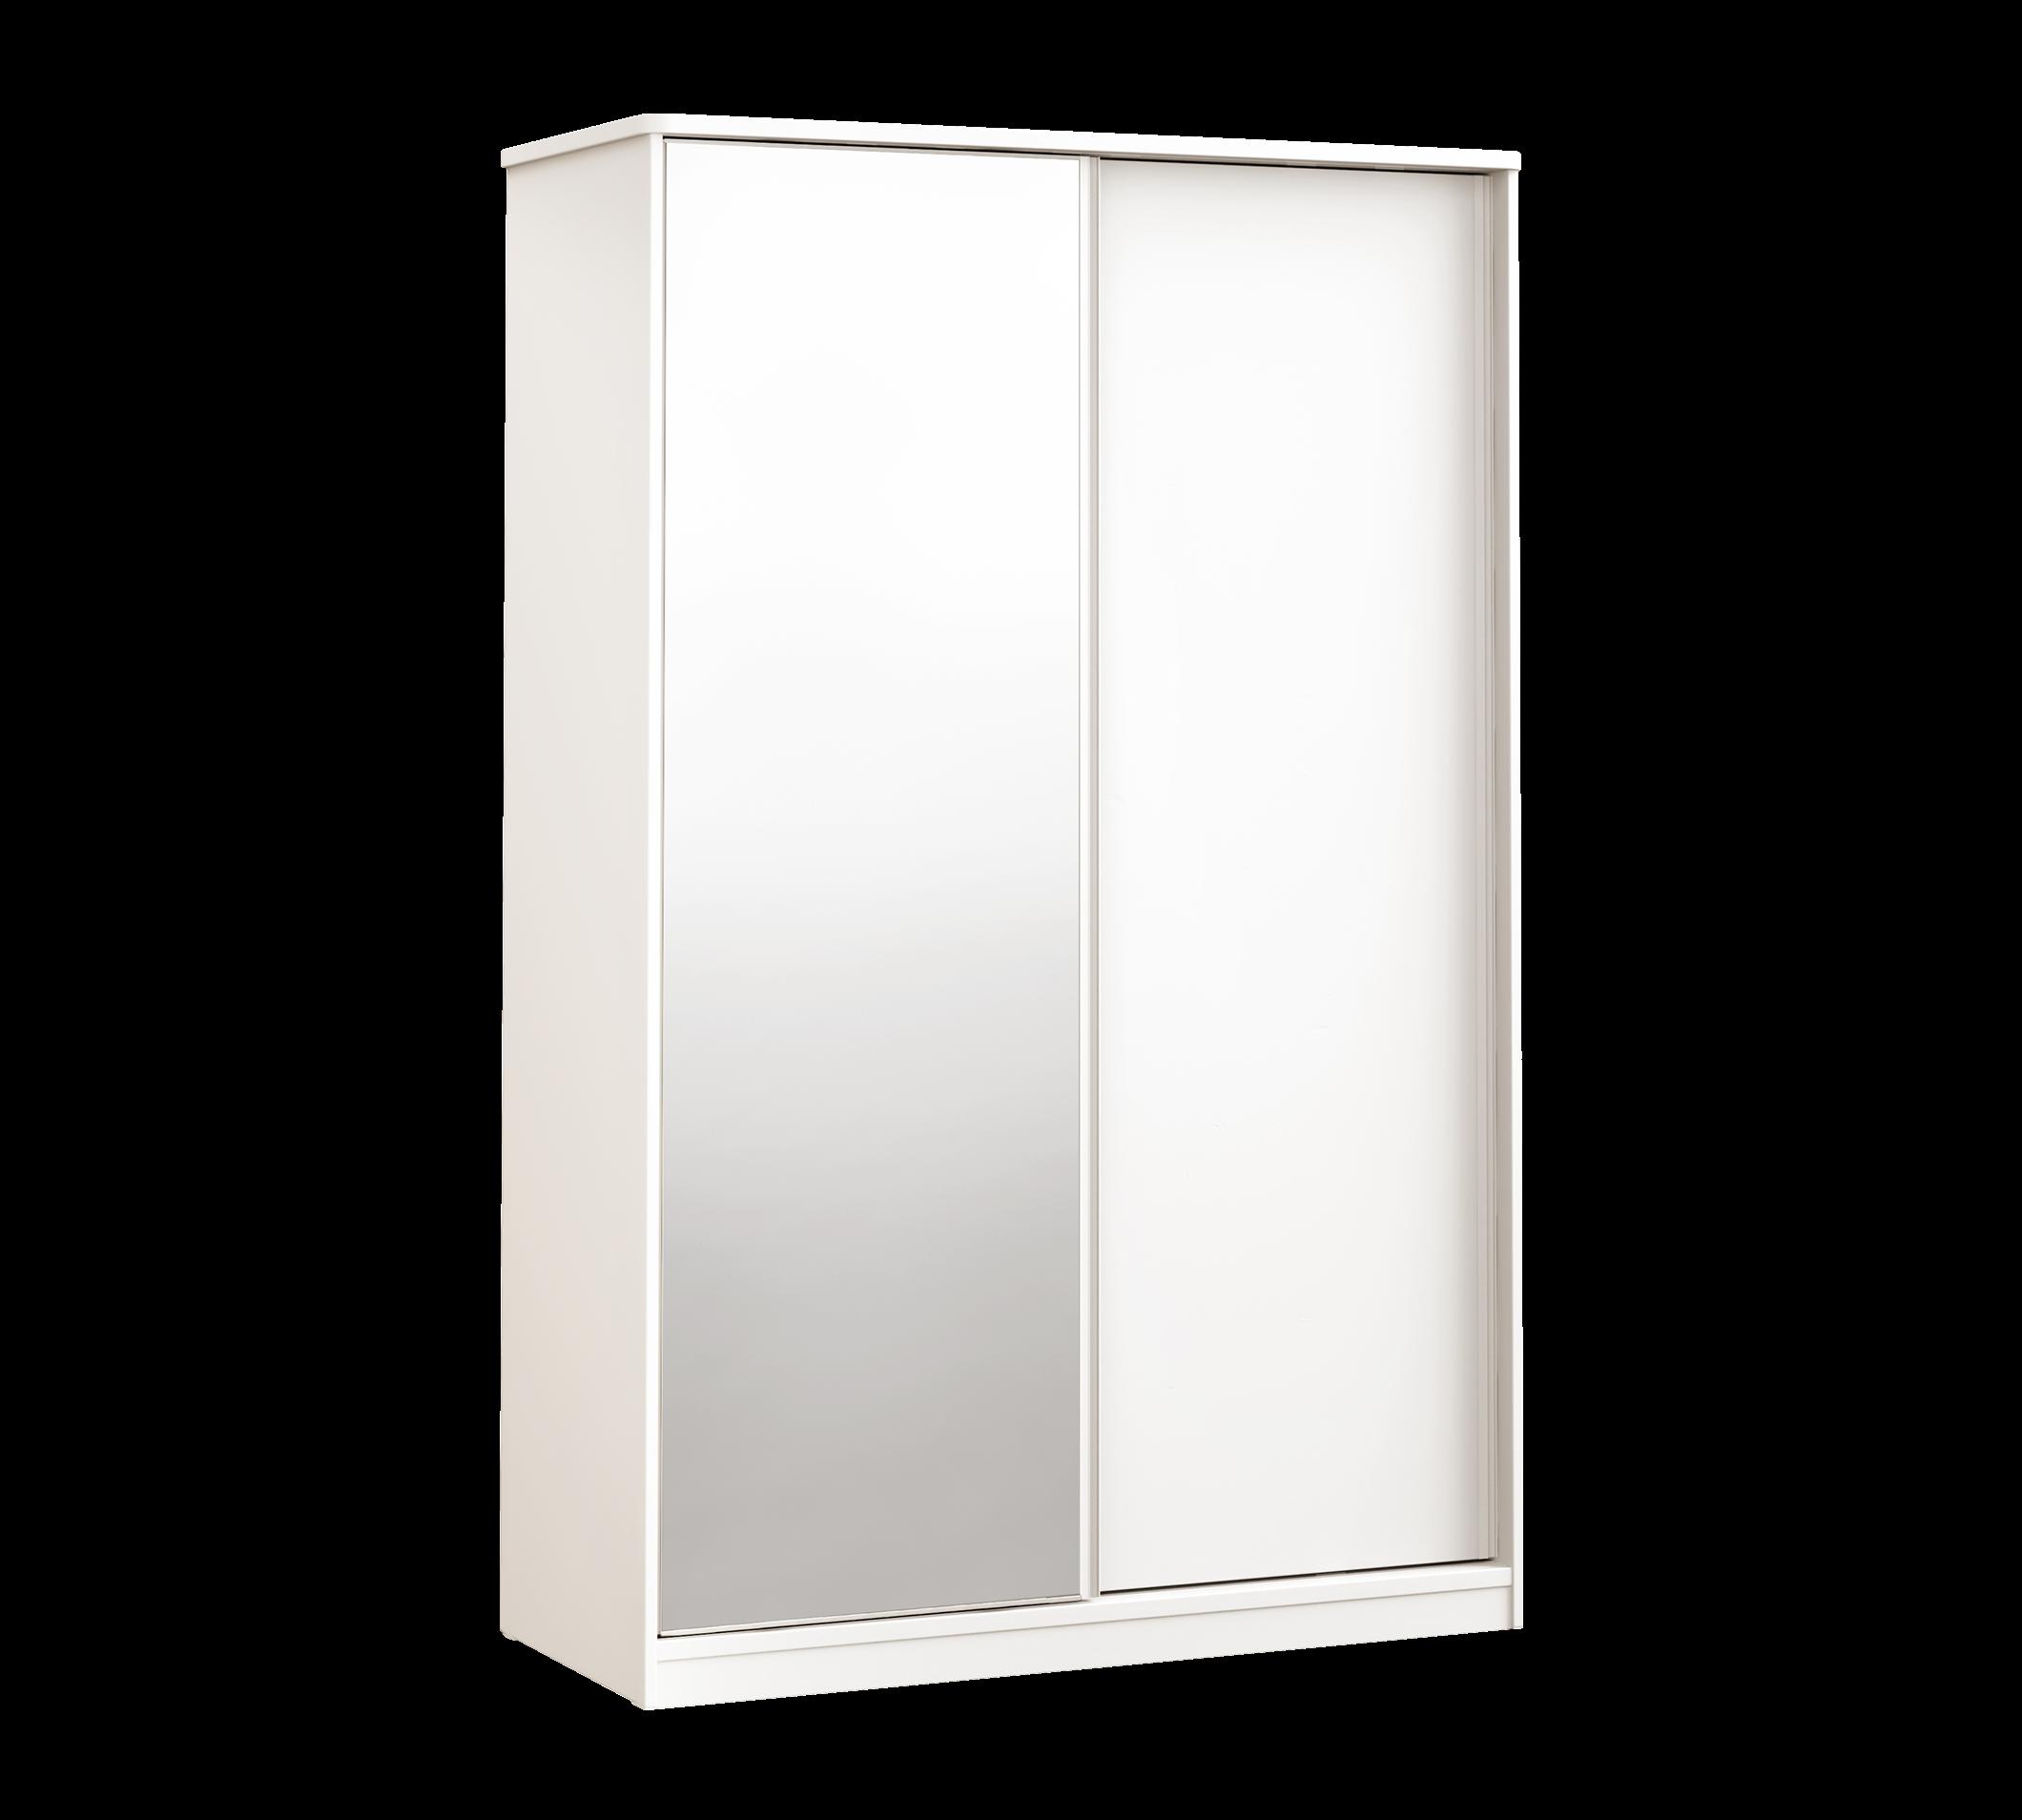 Dulap din pal cu 2 usi glisante si oglinda, pentru tineret White Small, l132xA59xH206 cm